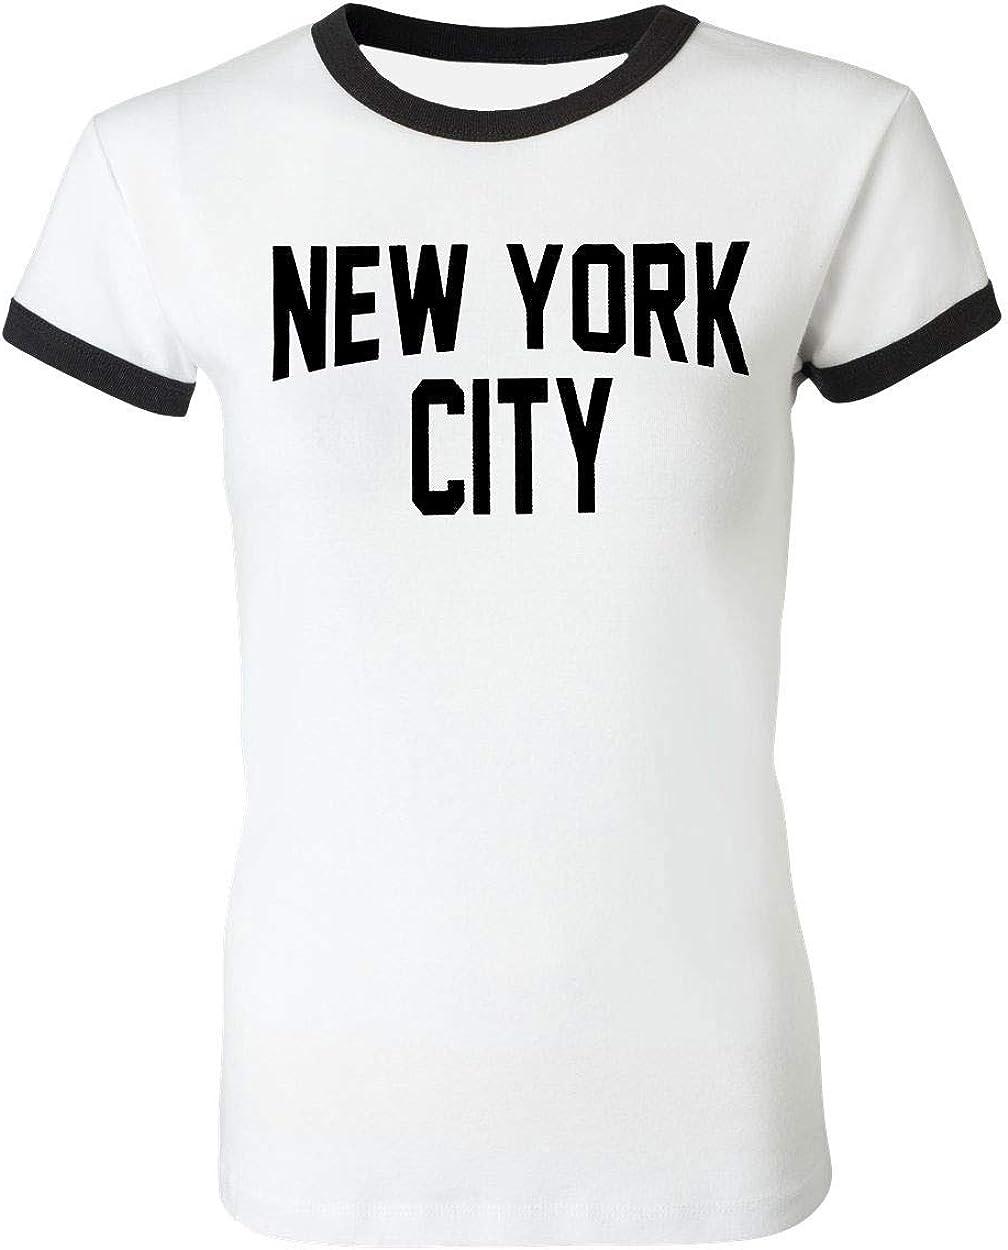 Ladies New York City Ringer Shirt Distressed Retro Design Tee Black White